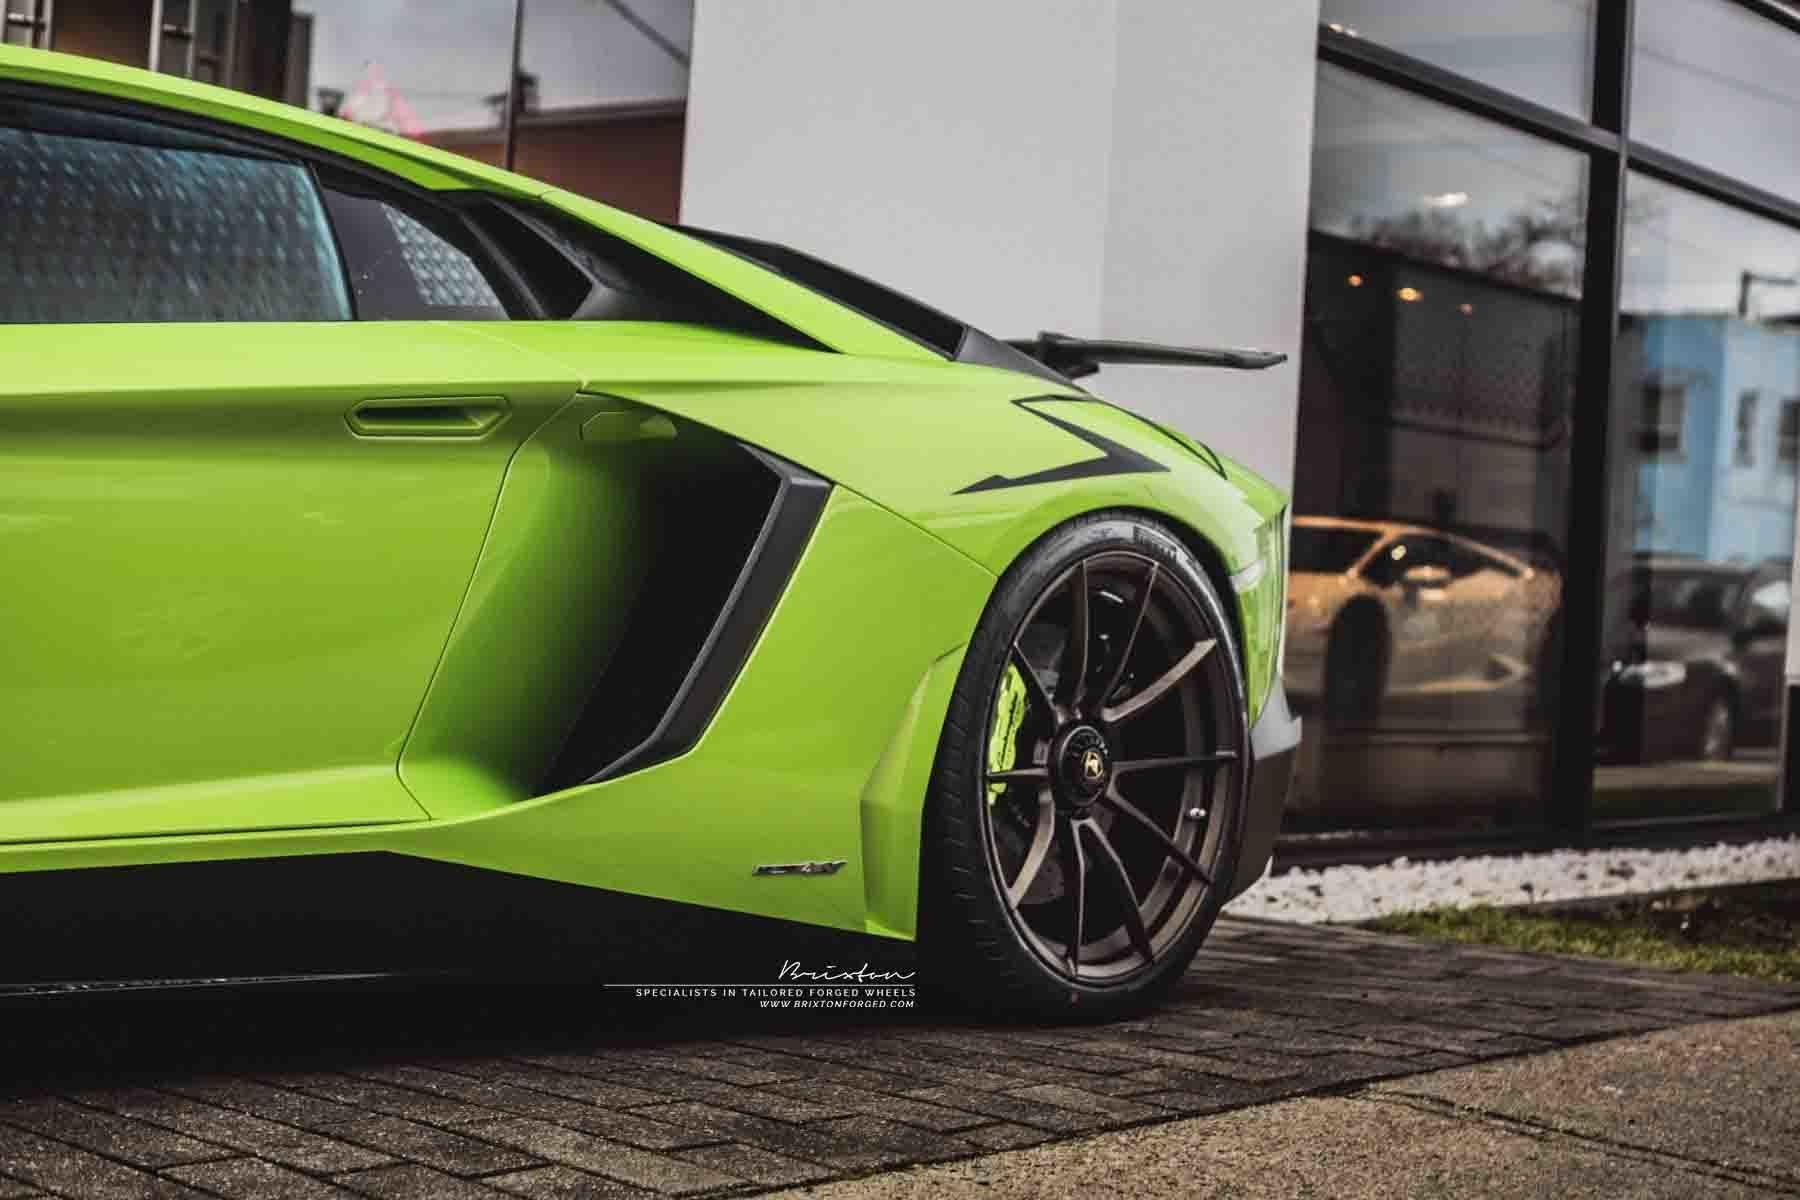 images-products-1-2408-232974696-verde-scandal-lamborghini-aventador-sv-lp750-4-brixton-forged-wheels-wr3-ultrasport-fine-texture.jpg